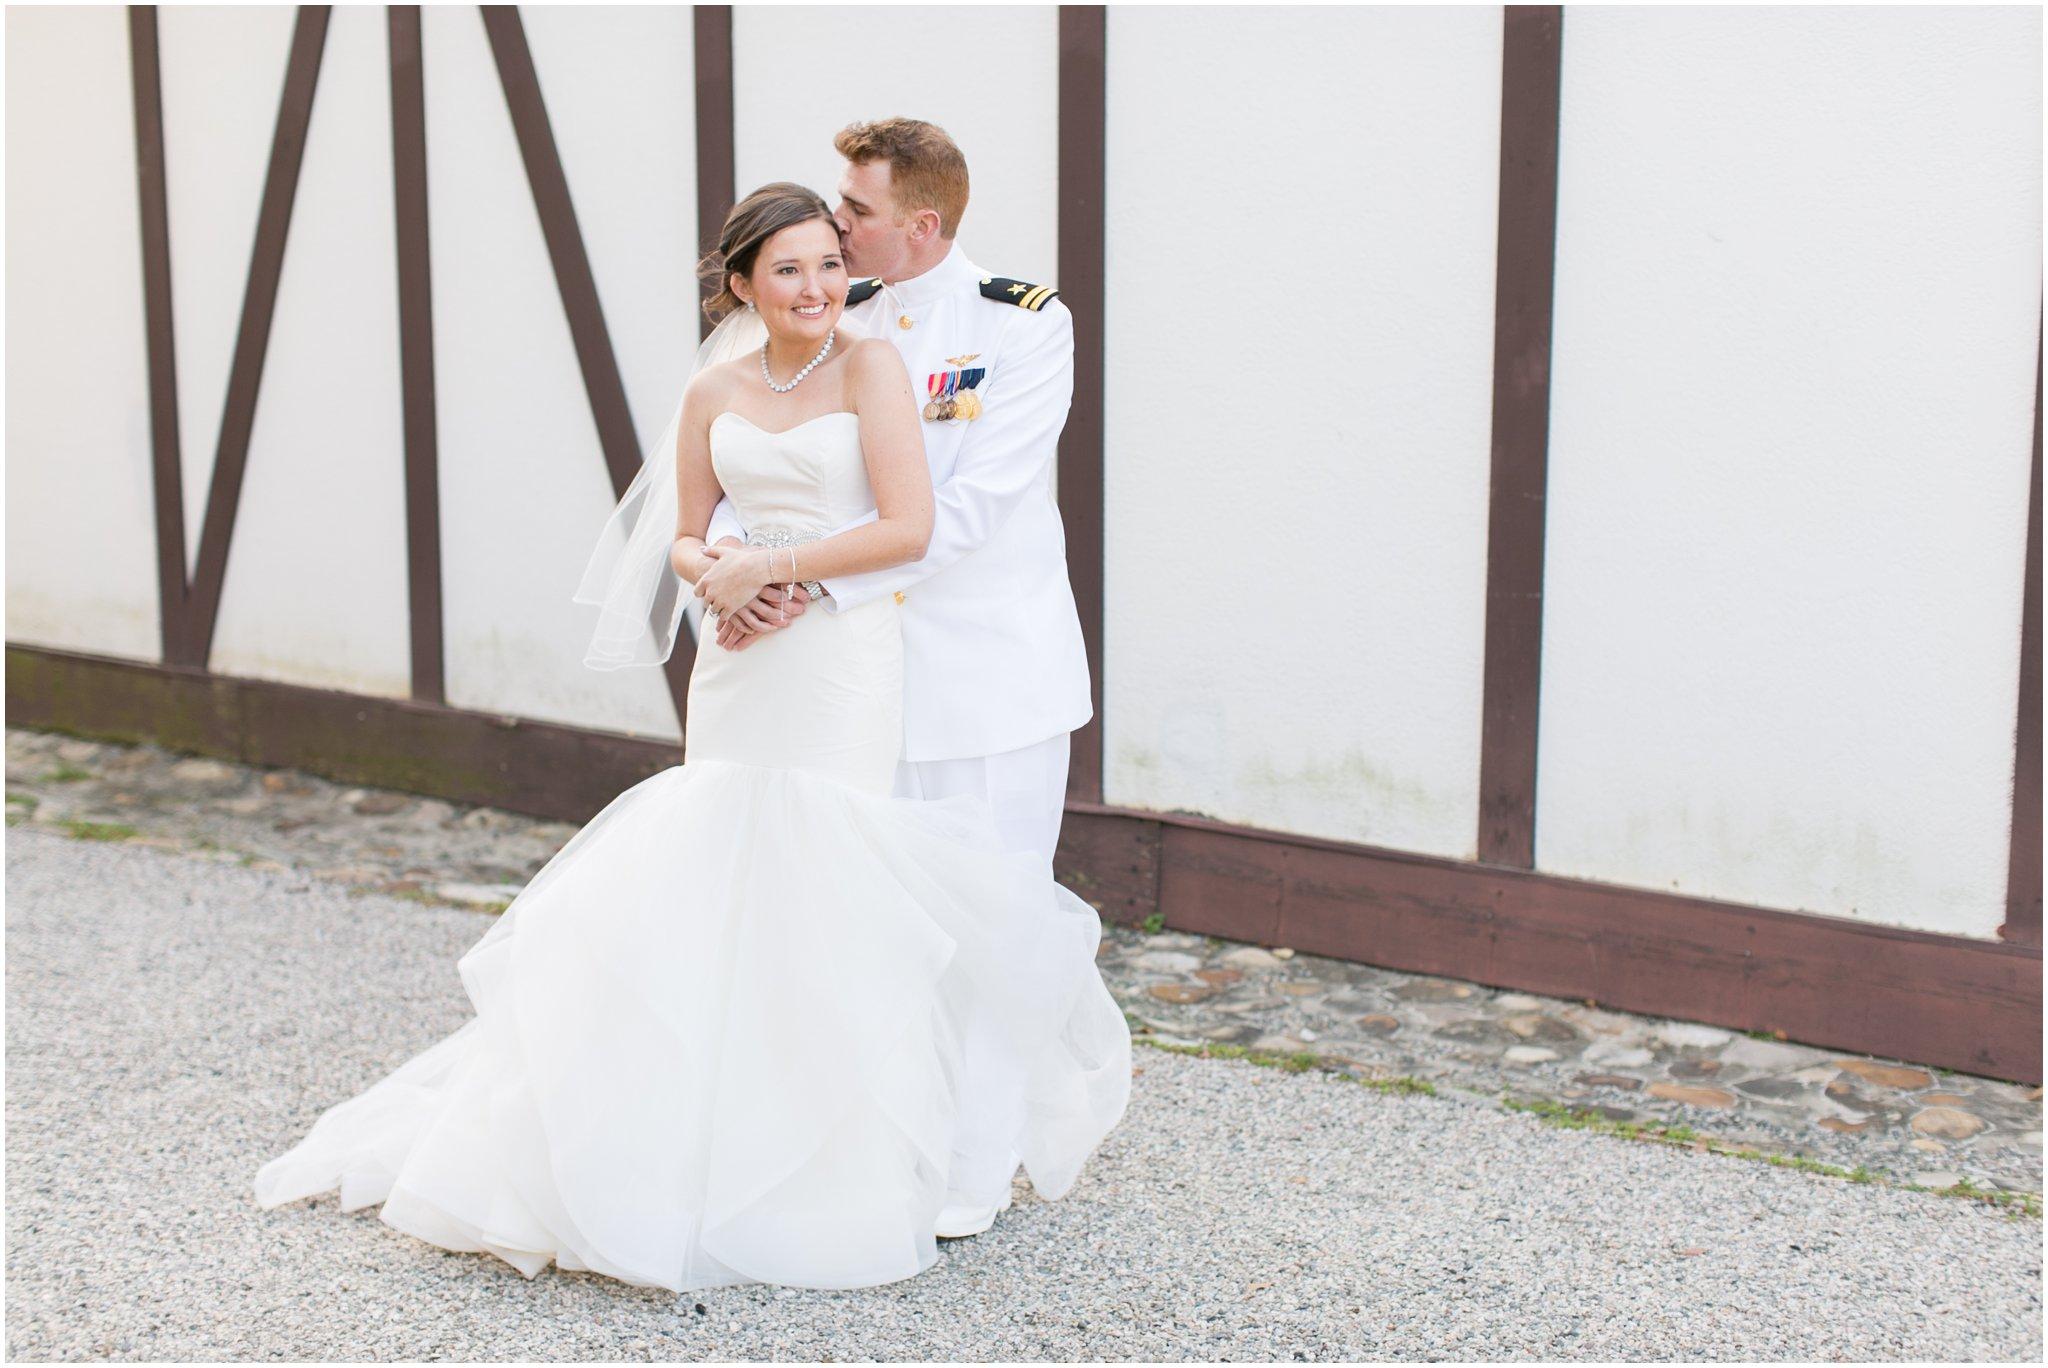 williamsburg winery wedding virginia bride and groom portrait